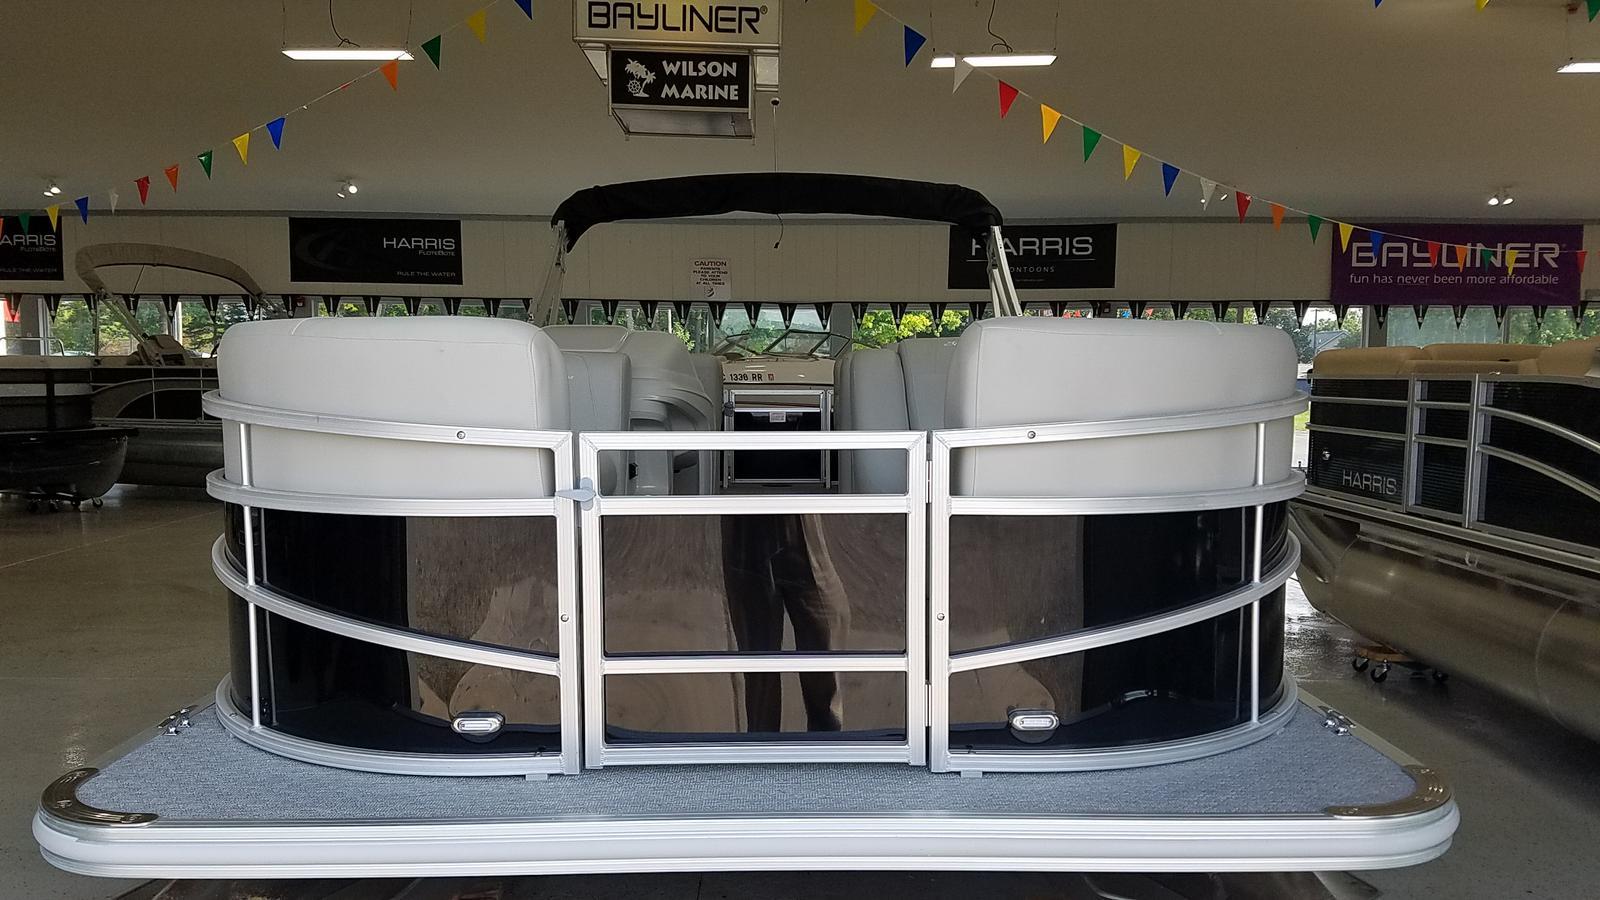 2021 SunChaser boat for sale, model of the boat is Vista 22 LR & Image # 2 of 7